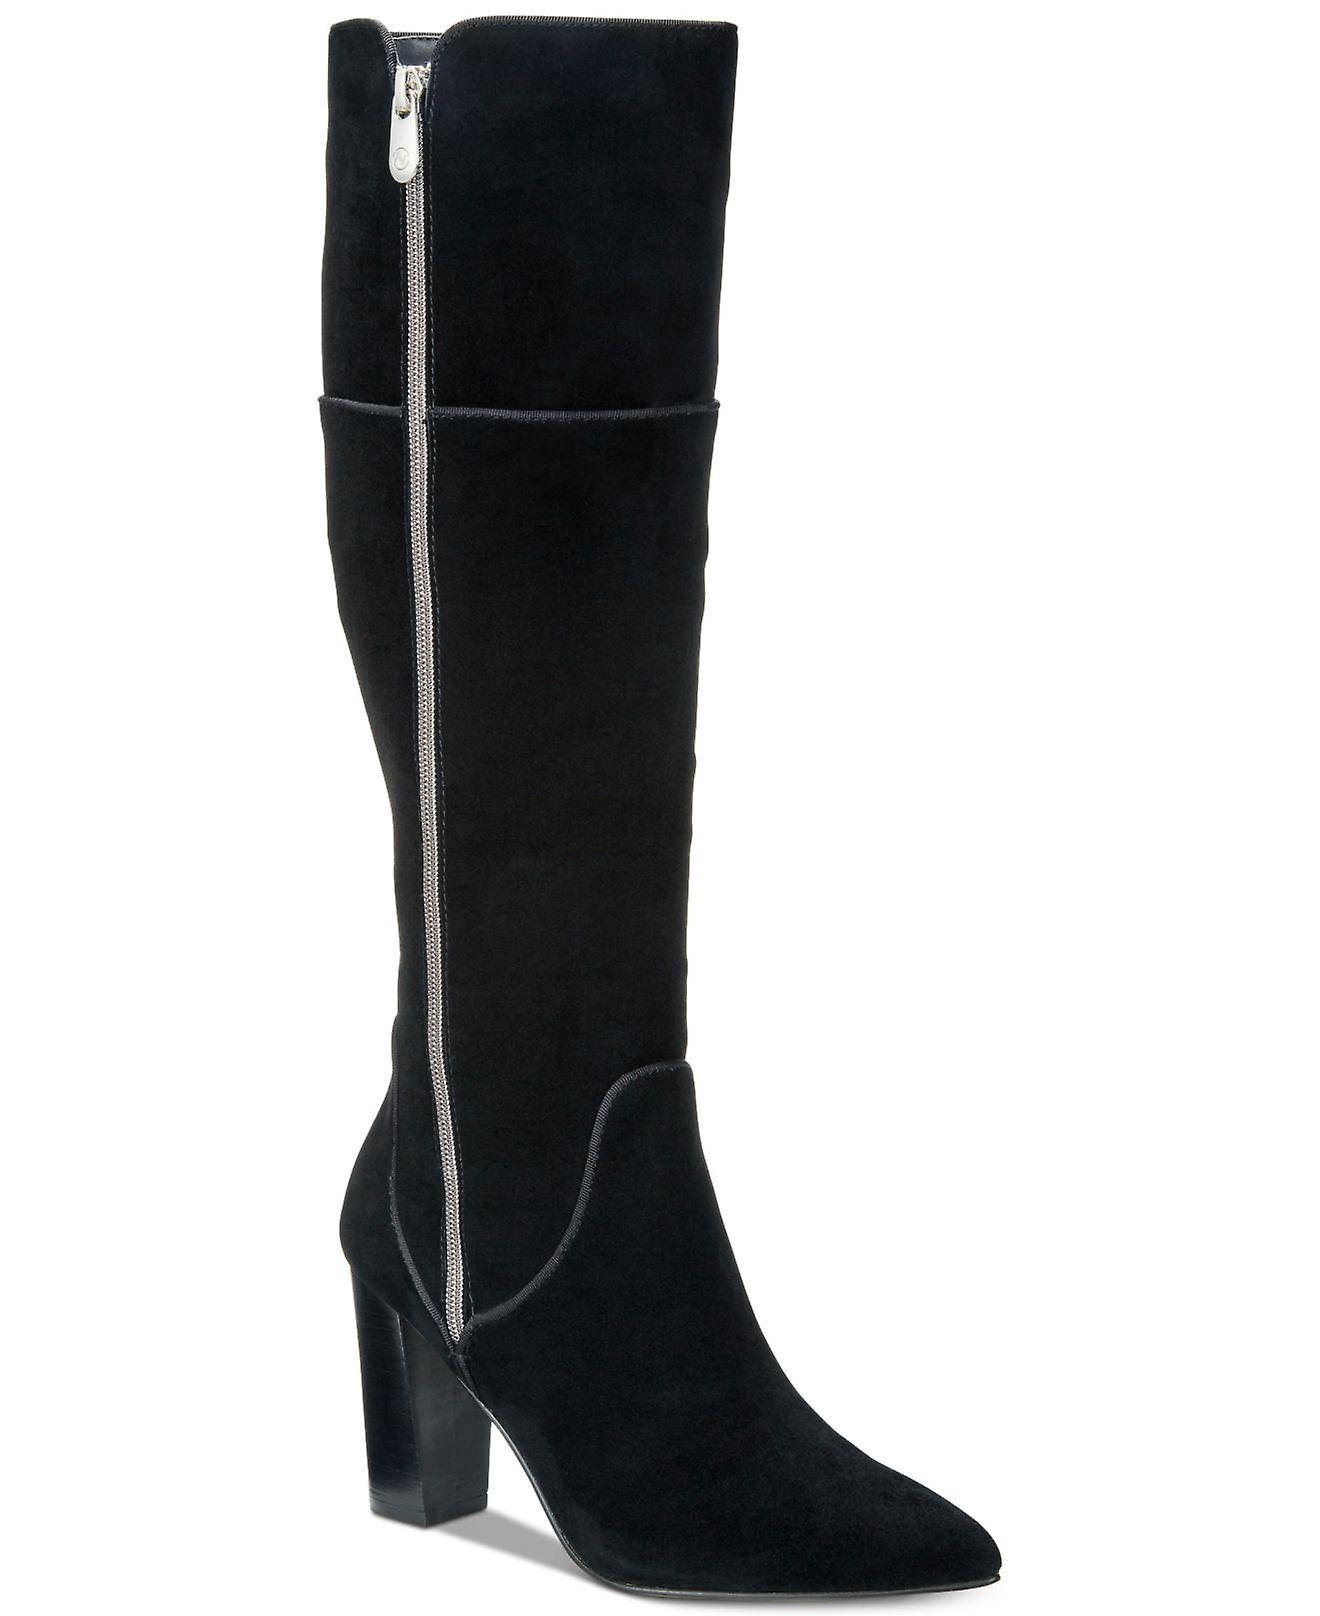 Adrienne Vittadini Kobiety Neeva Skóra Wskazał Toe Knee High Fashion Buty wt475